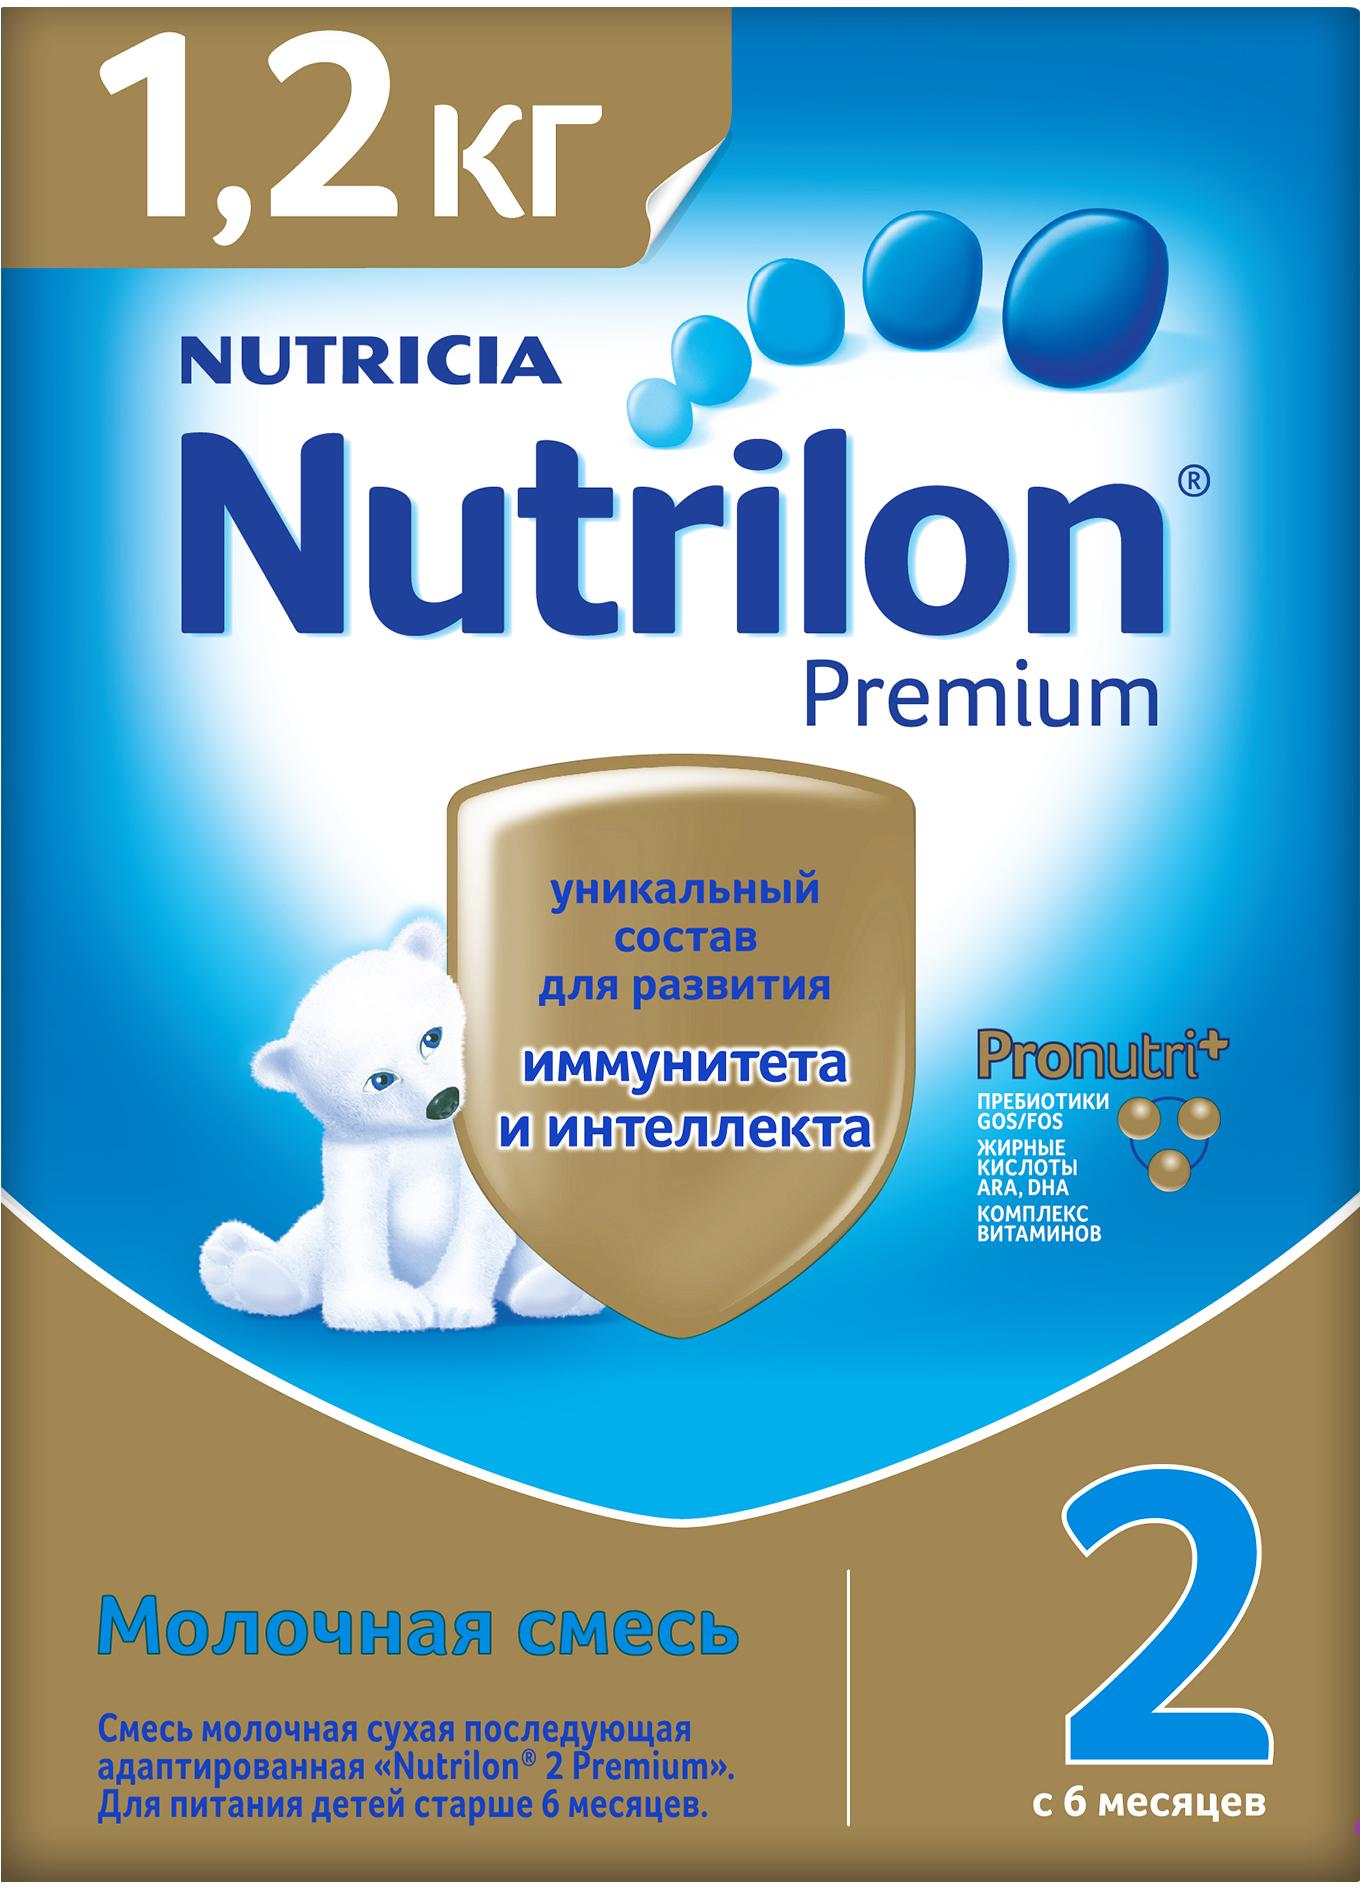 Молочная смесь Nutrilon Nutrilon (Nutricia) 2 Premium (c 6 месяцев) 1200 г молочная смесь nutricia nutrilon nutricia 2 premium c 6 месяцев 800 г